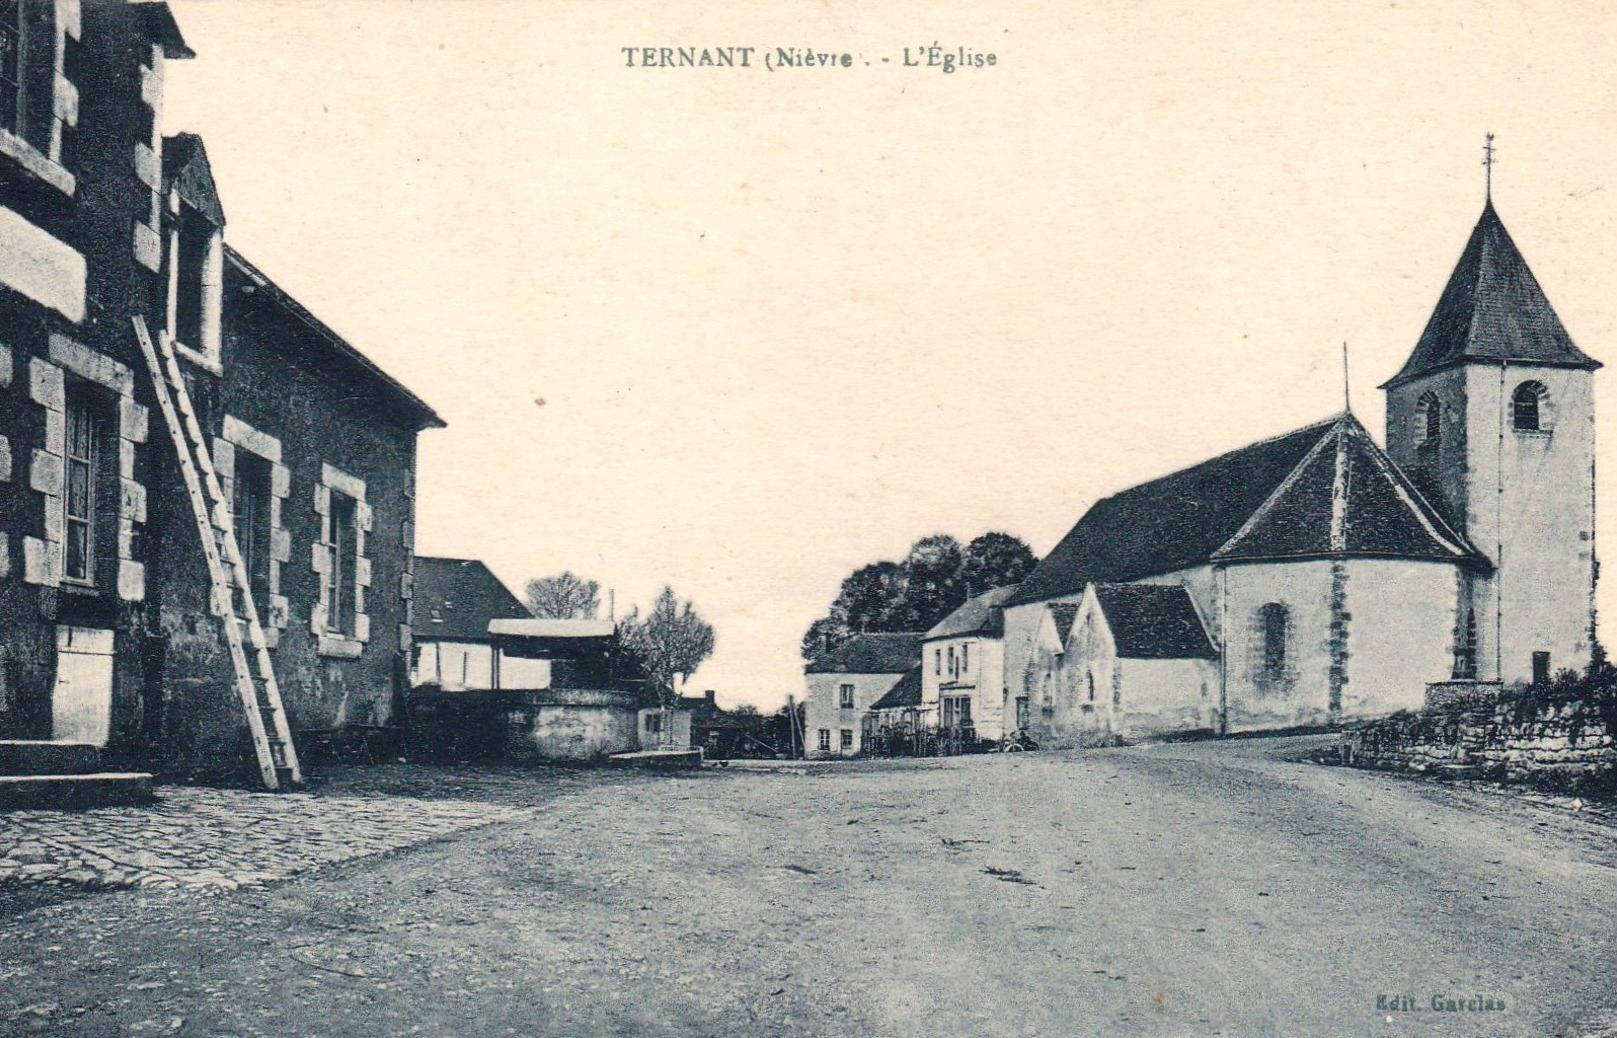 Ternant (Nièvre) L'église Saint-Roch CPA